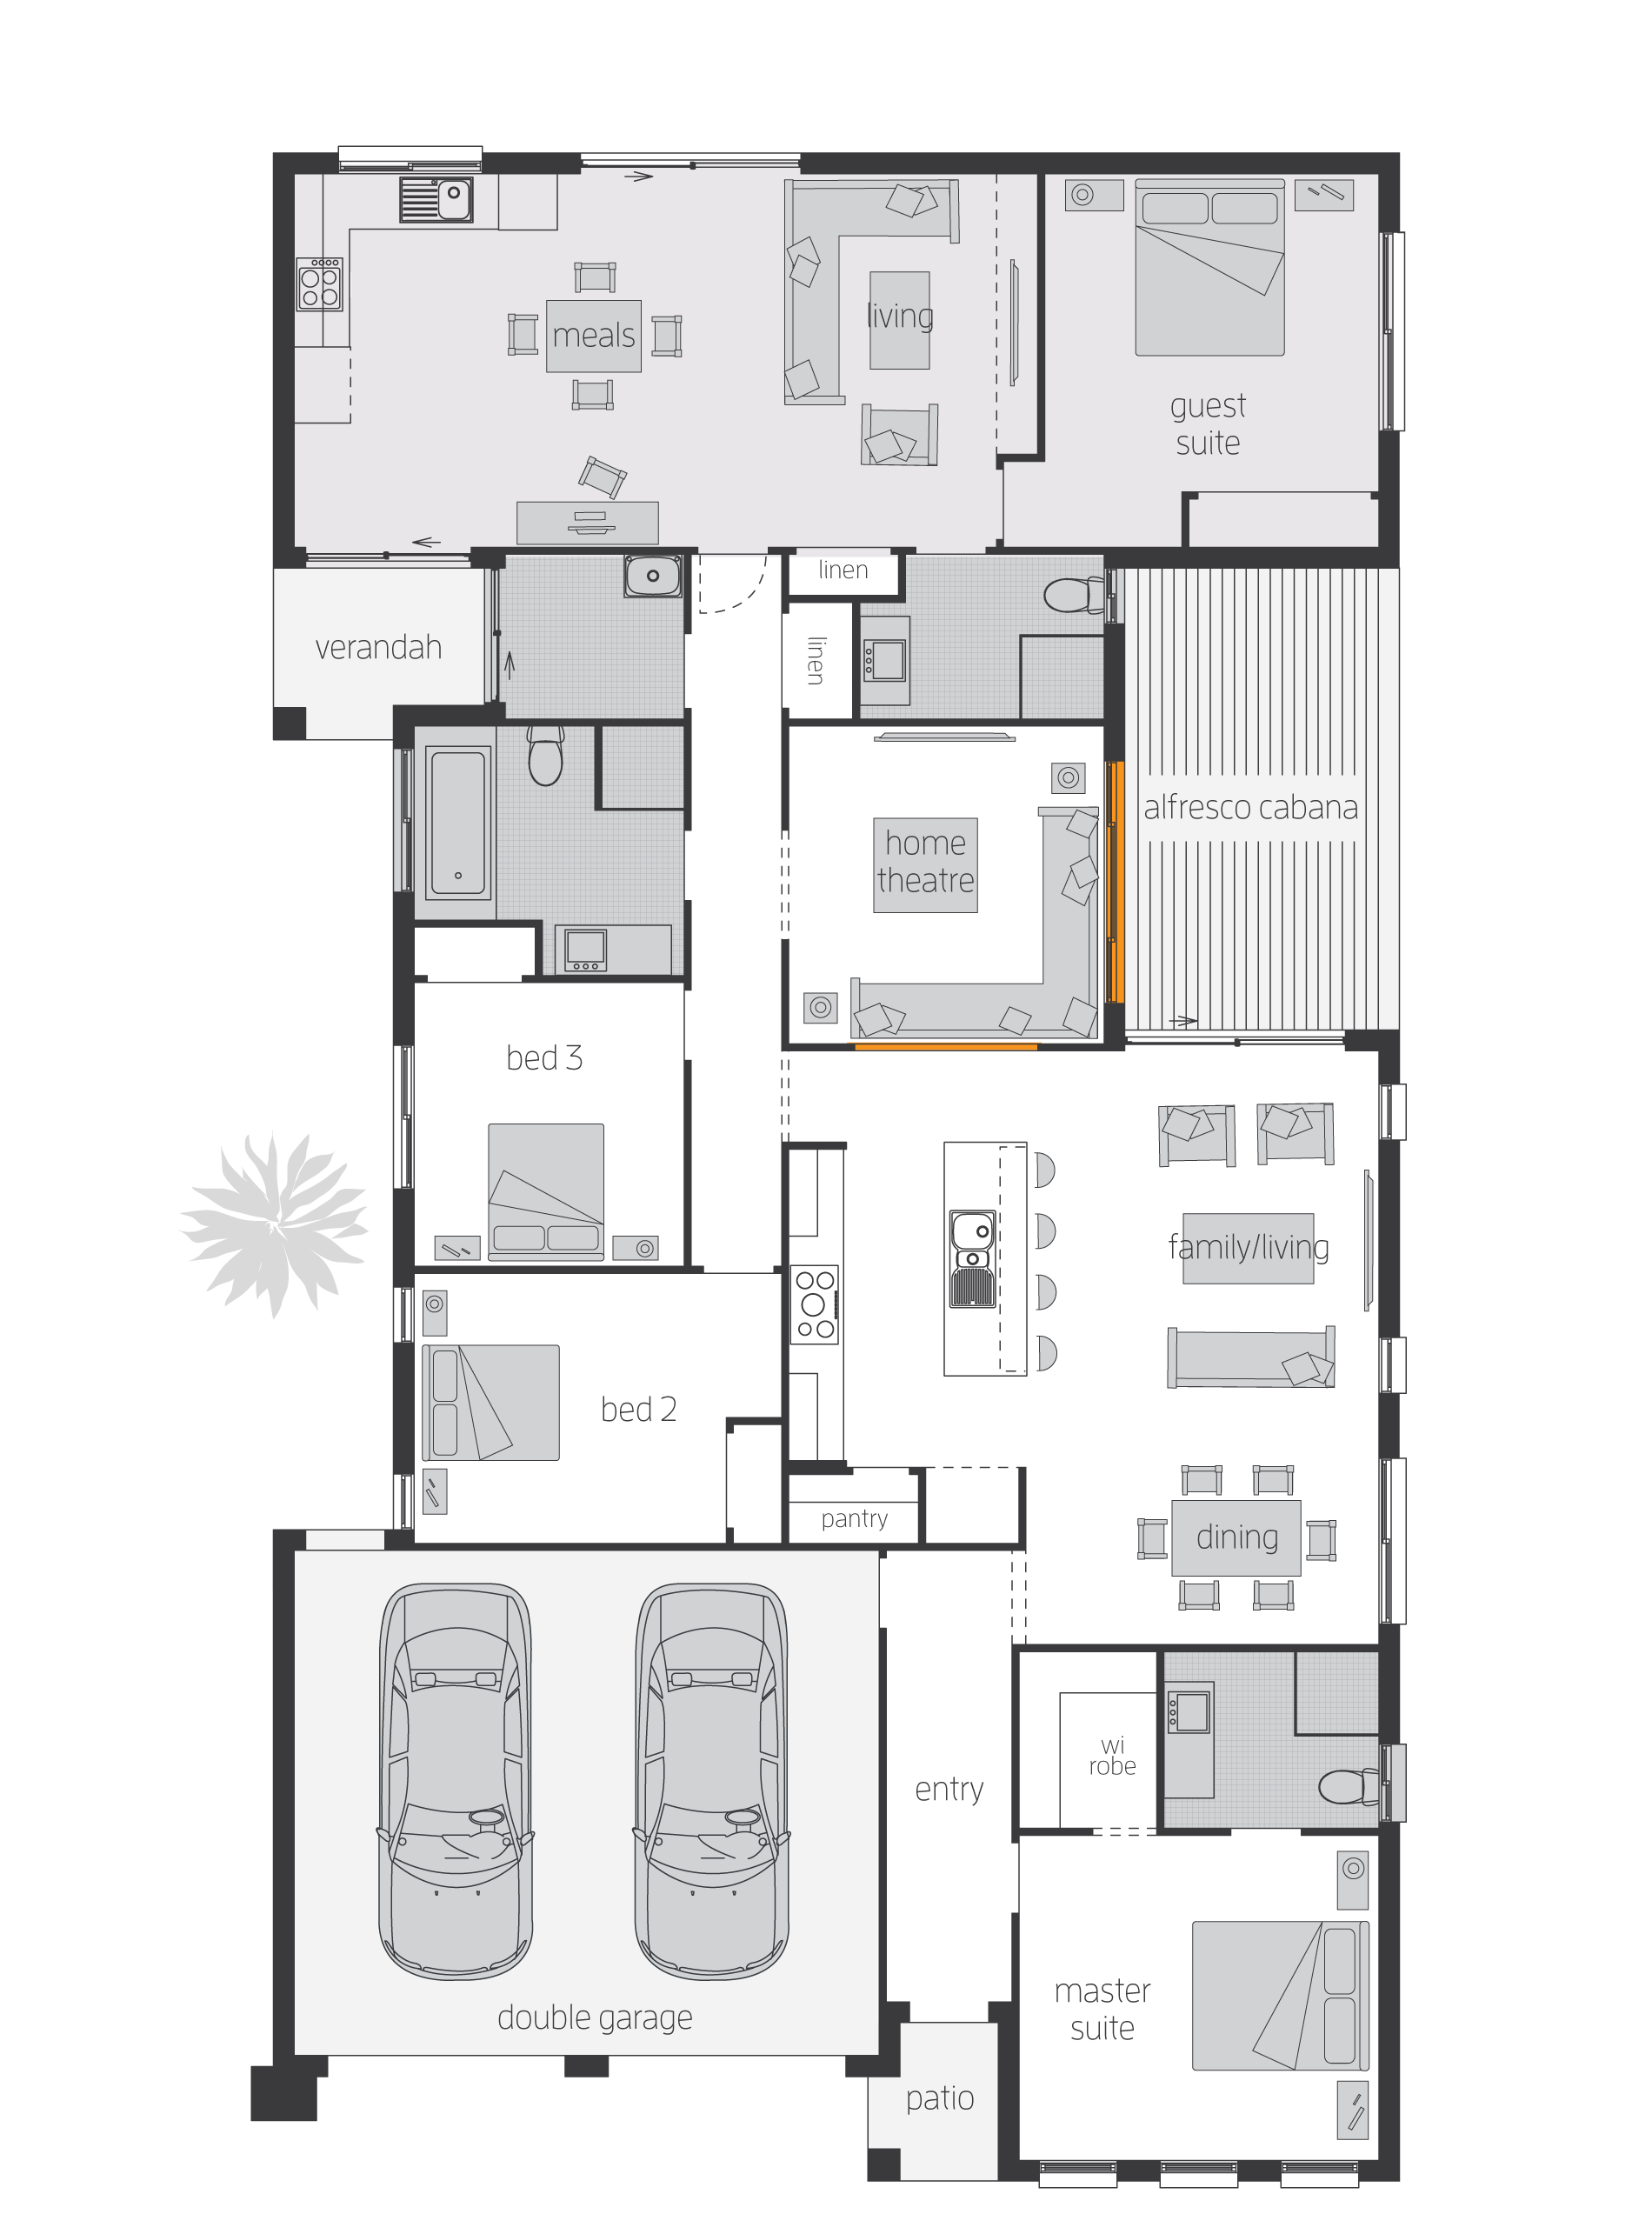 Duo2 Floor Plan By Mcdonald Jones Perfect For Extended